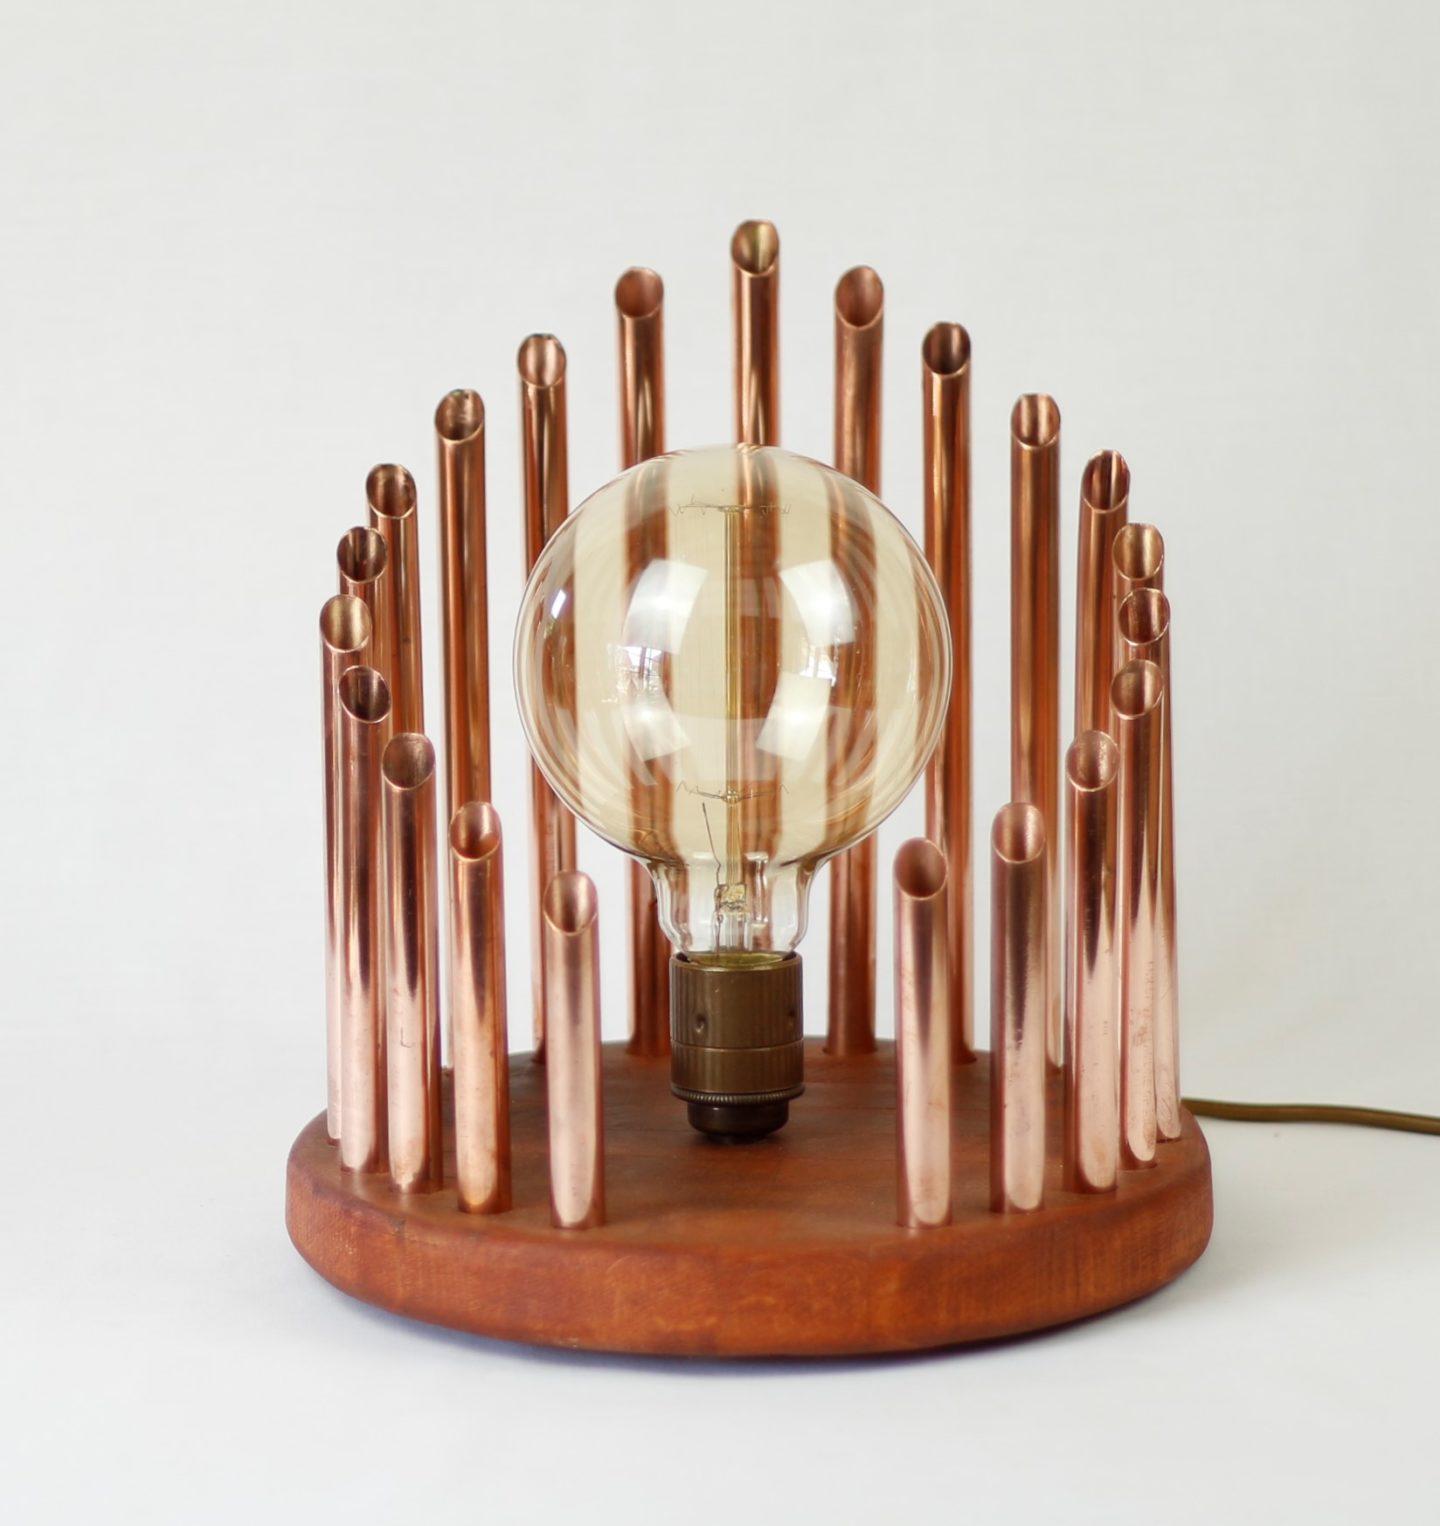 The organ handmade copper light by Light'artedly